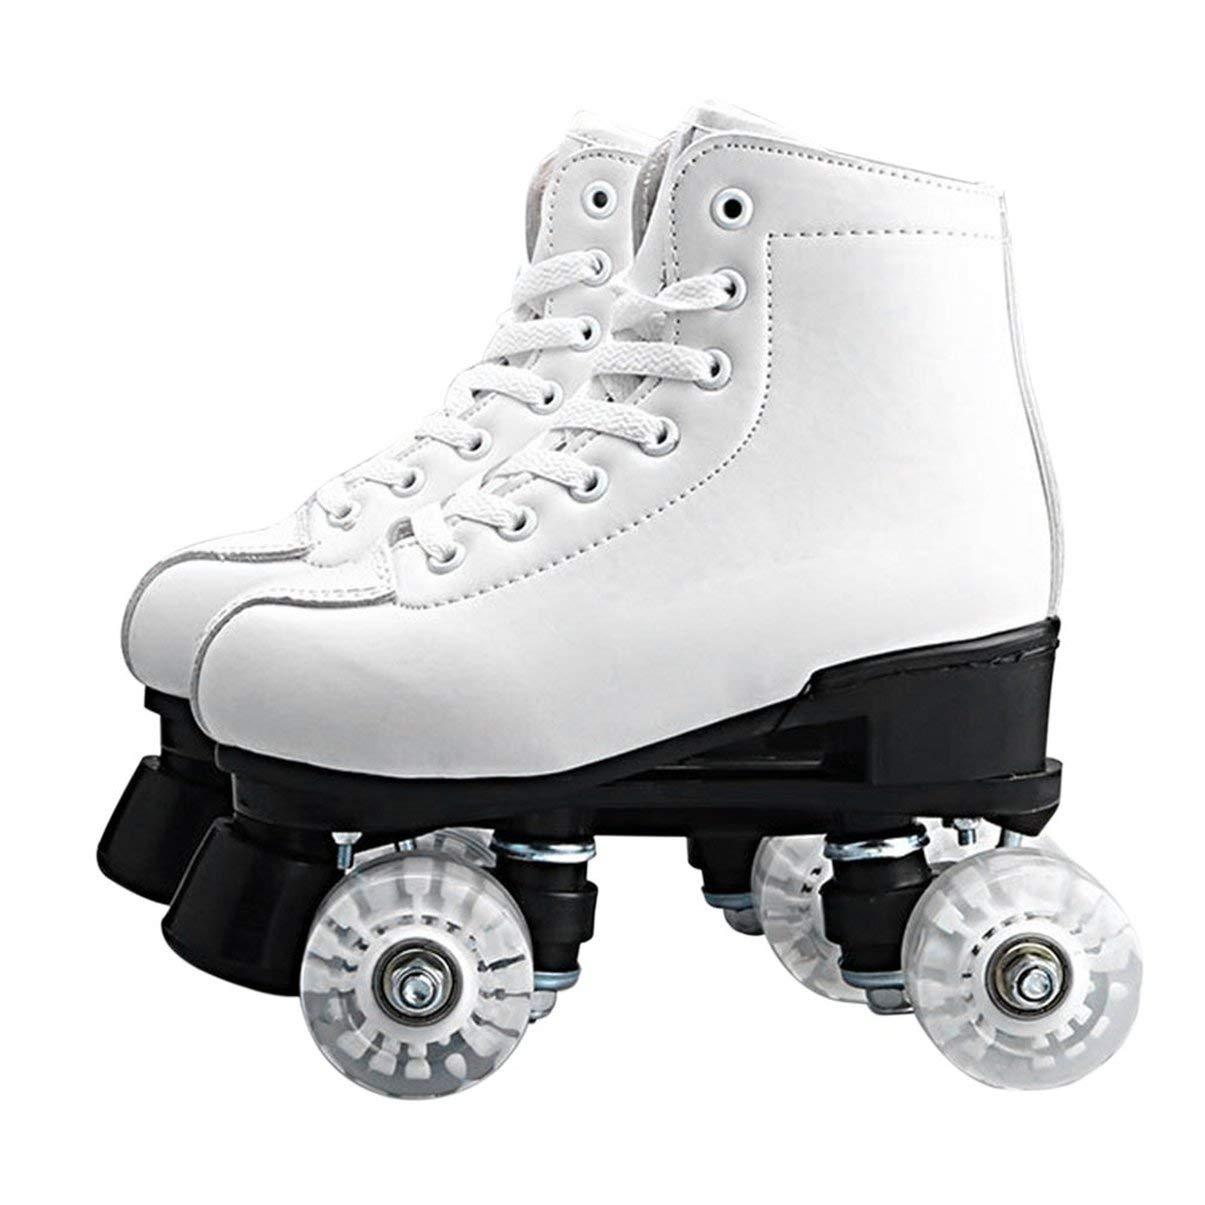 JullyeleDEgant Einfarbige Doppel-Rollschuhe Zwei-Line Rollschuh 4 Rollen Lace-up-Skate-Schuhe mit bunten LED-Licht